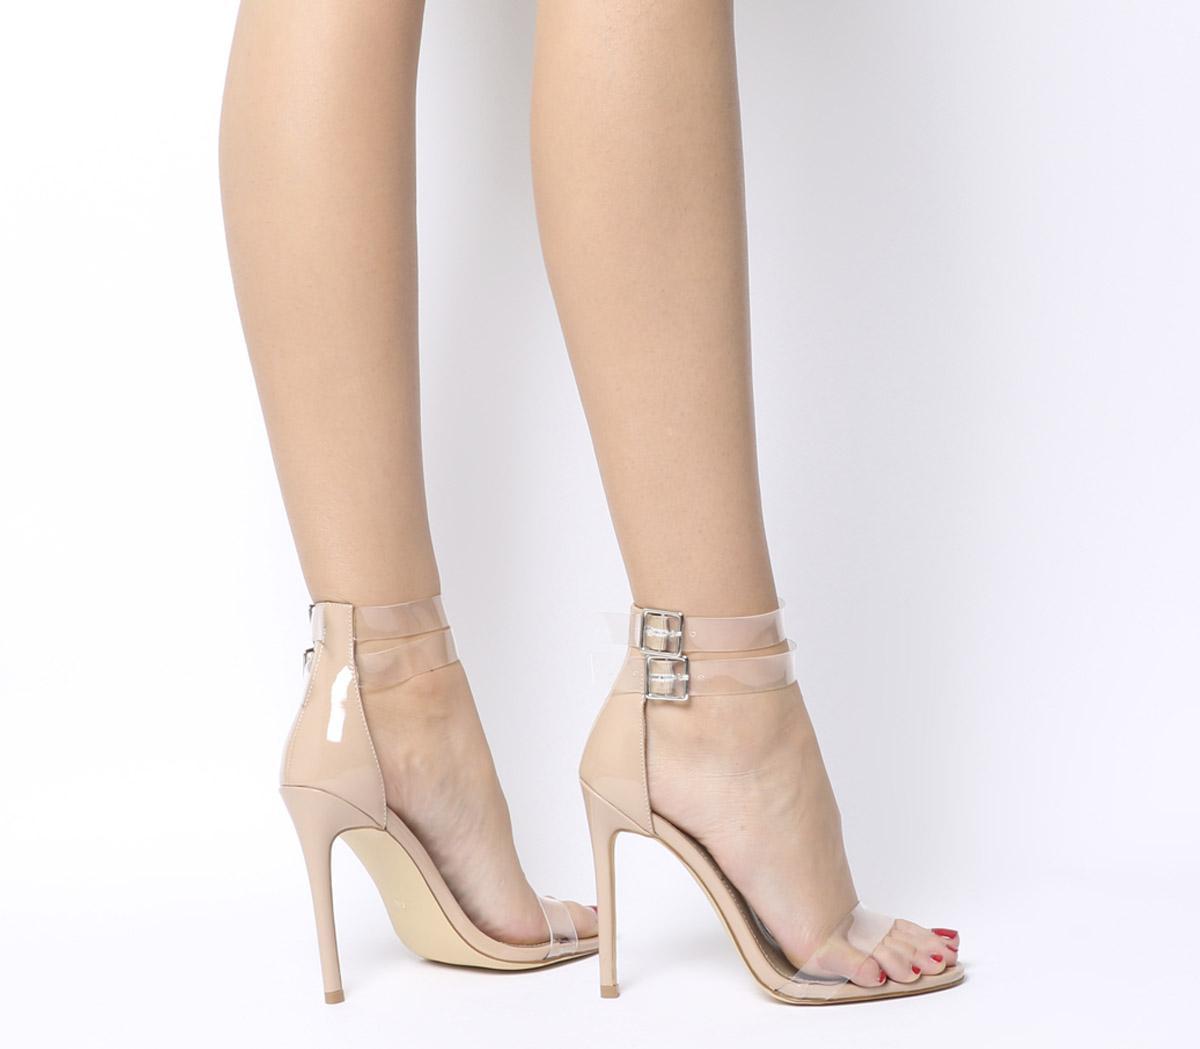 Winnie Transparent Cuff Heels by Ego